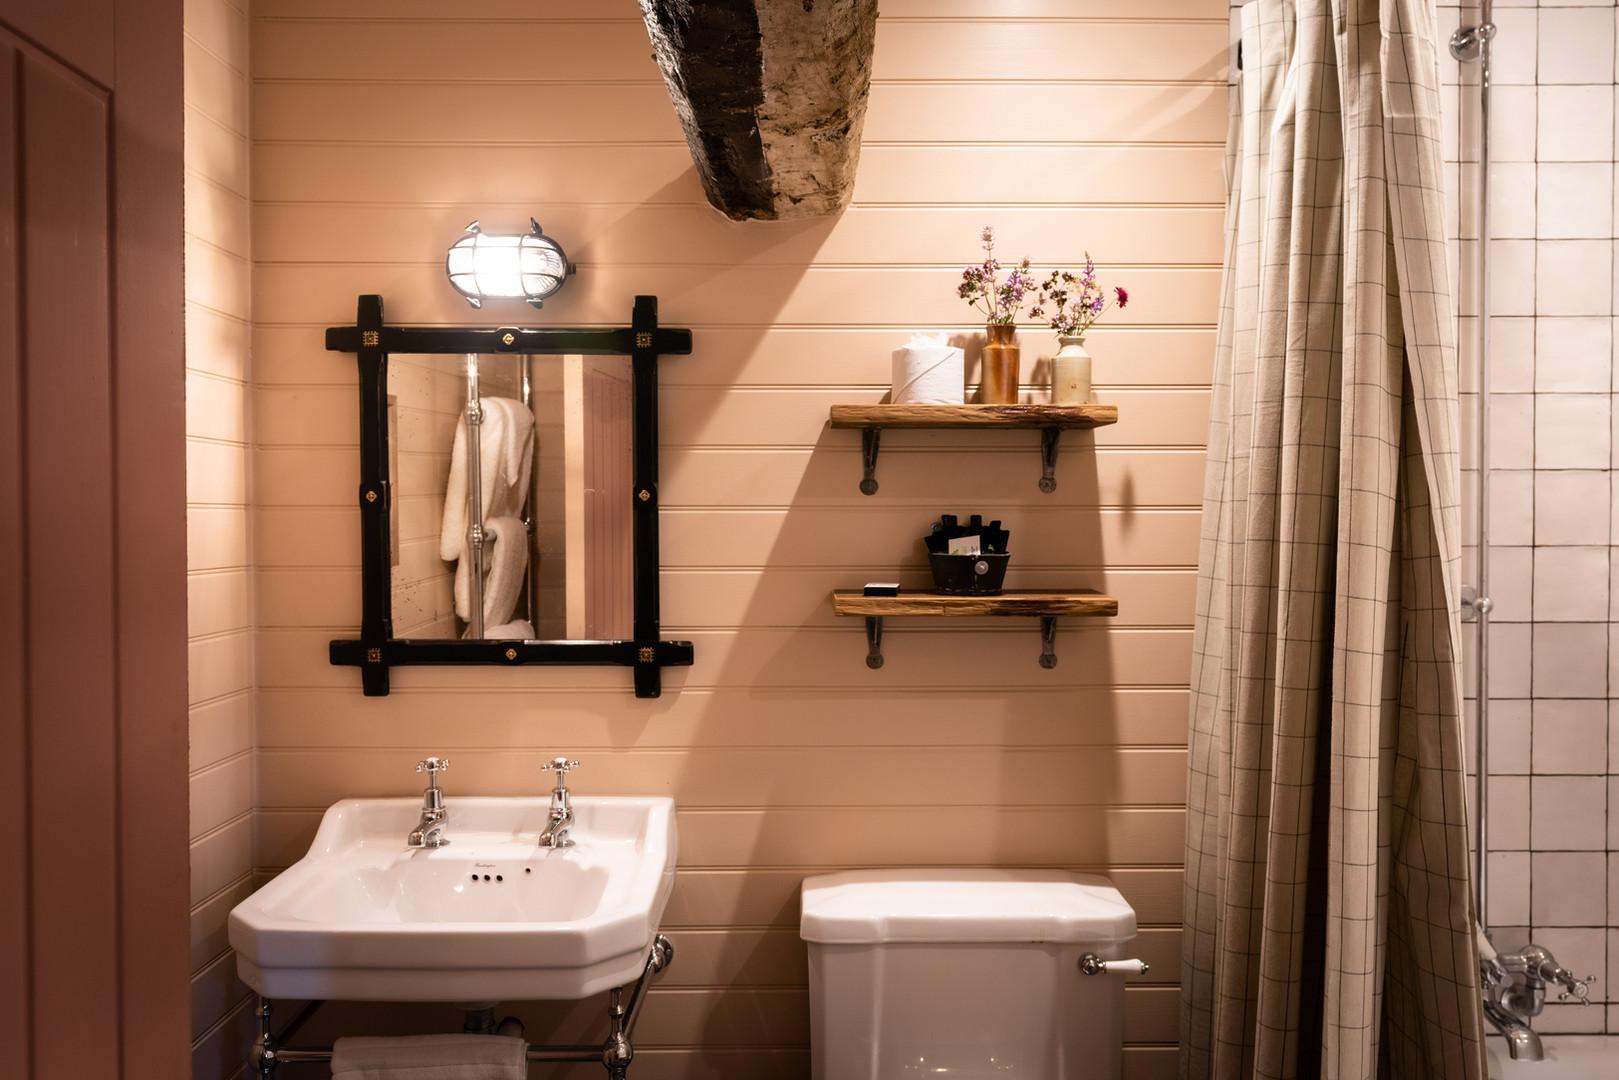 The Stable bathroom